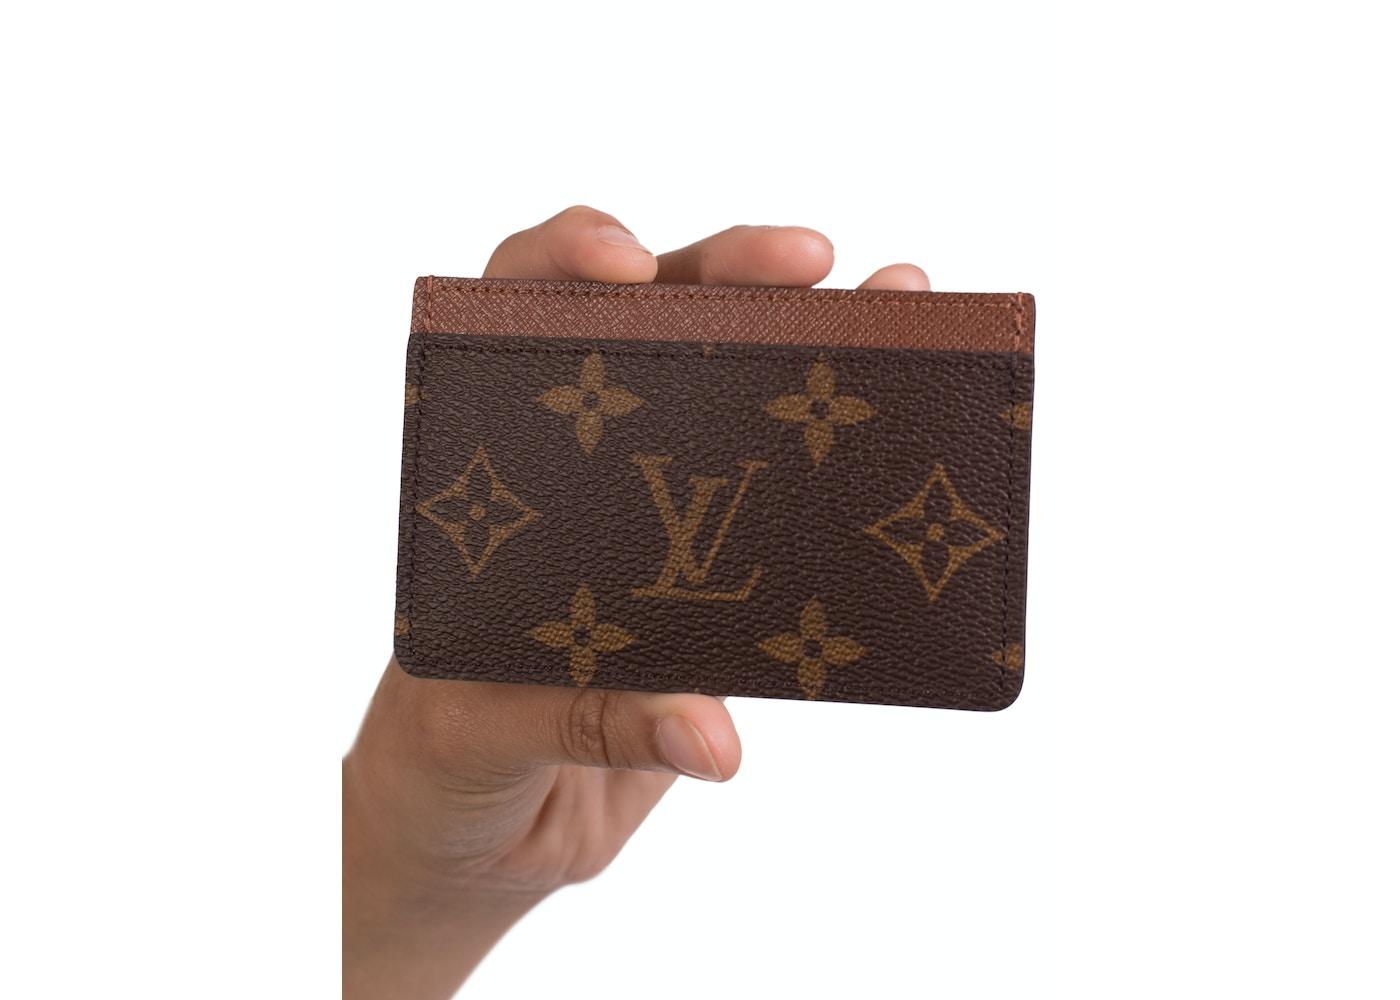 72ba8504a975 Louis Vuitton Card Holder Monogram